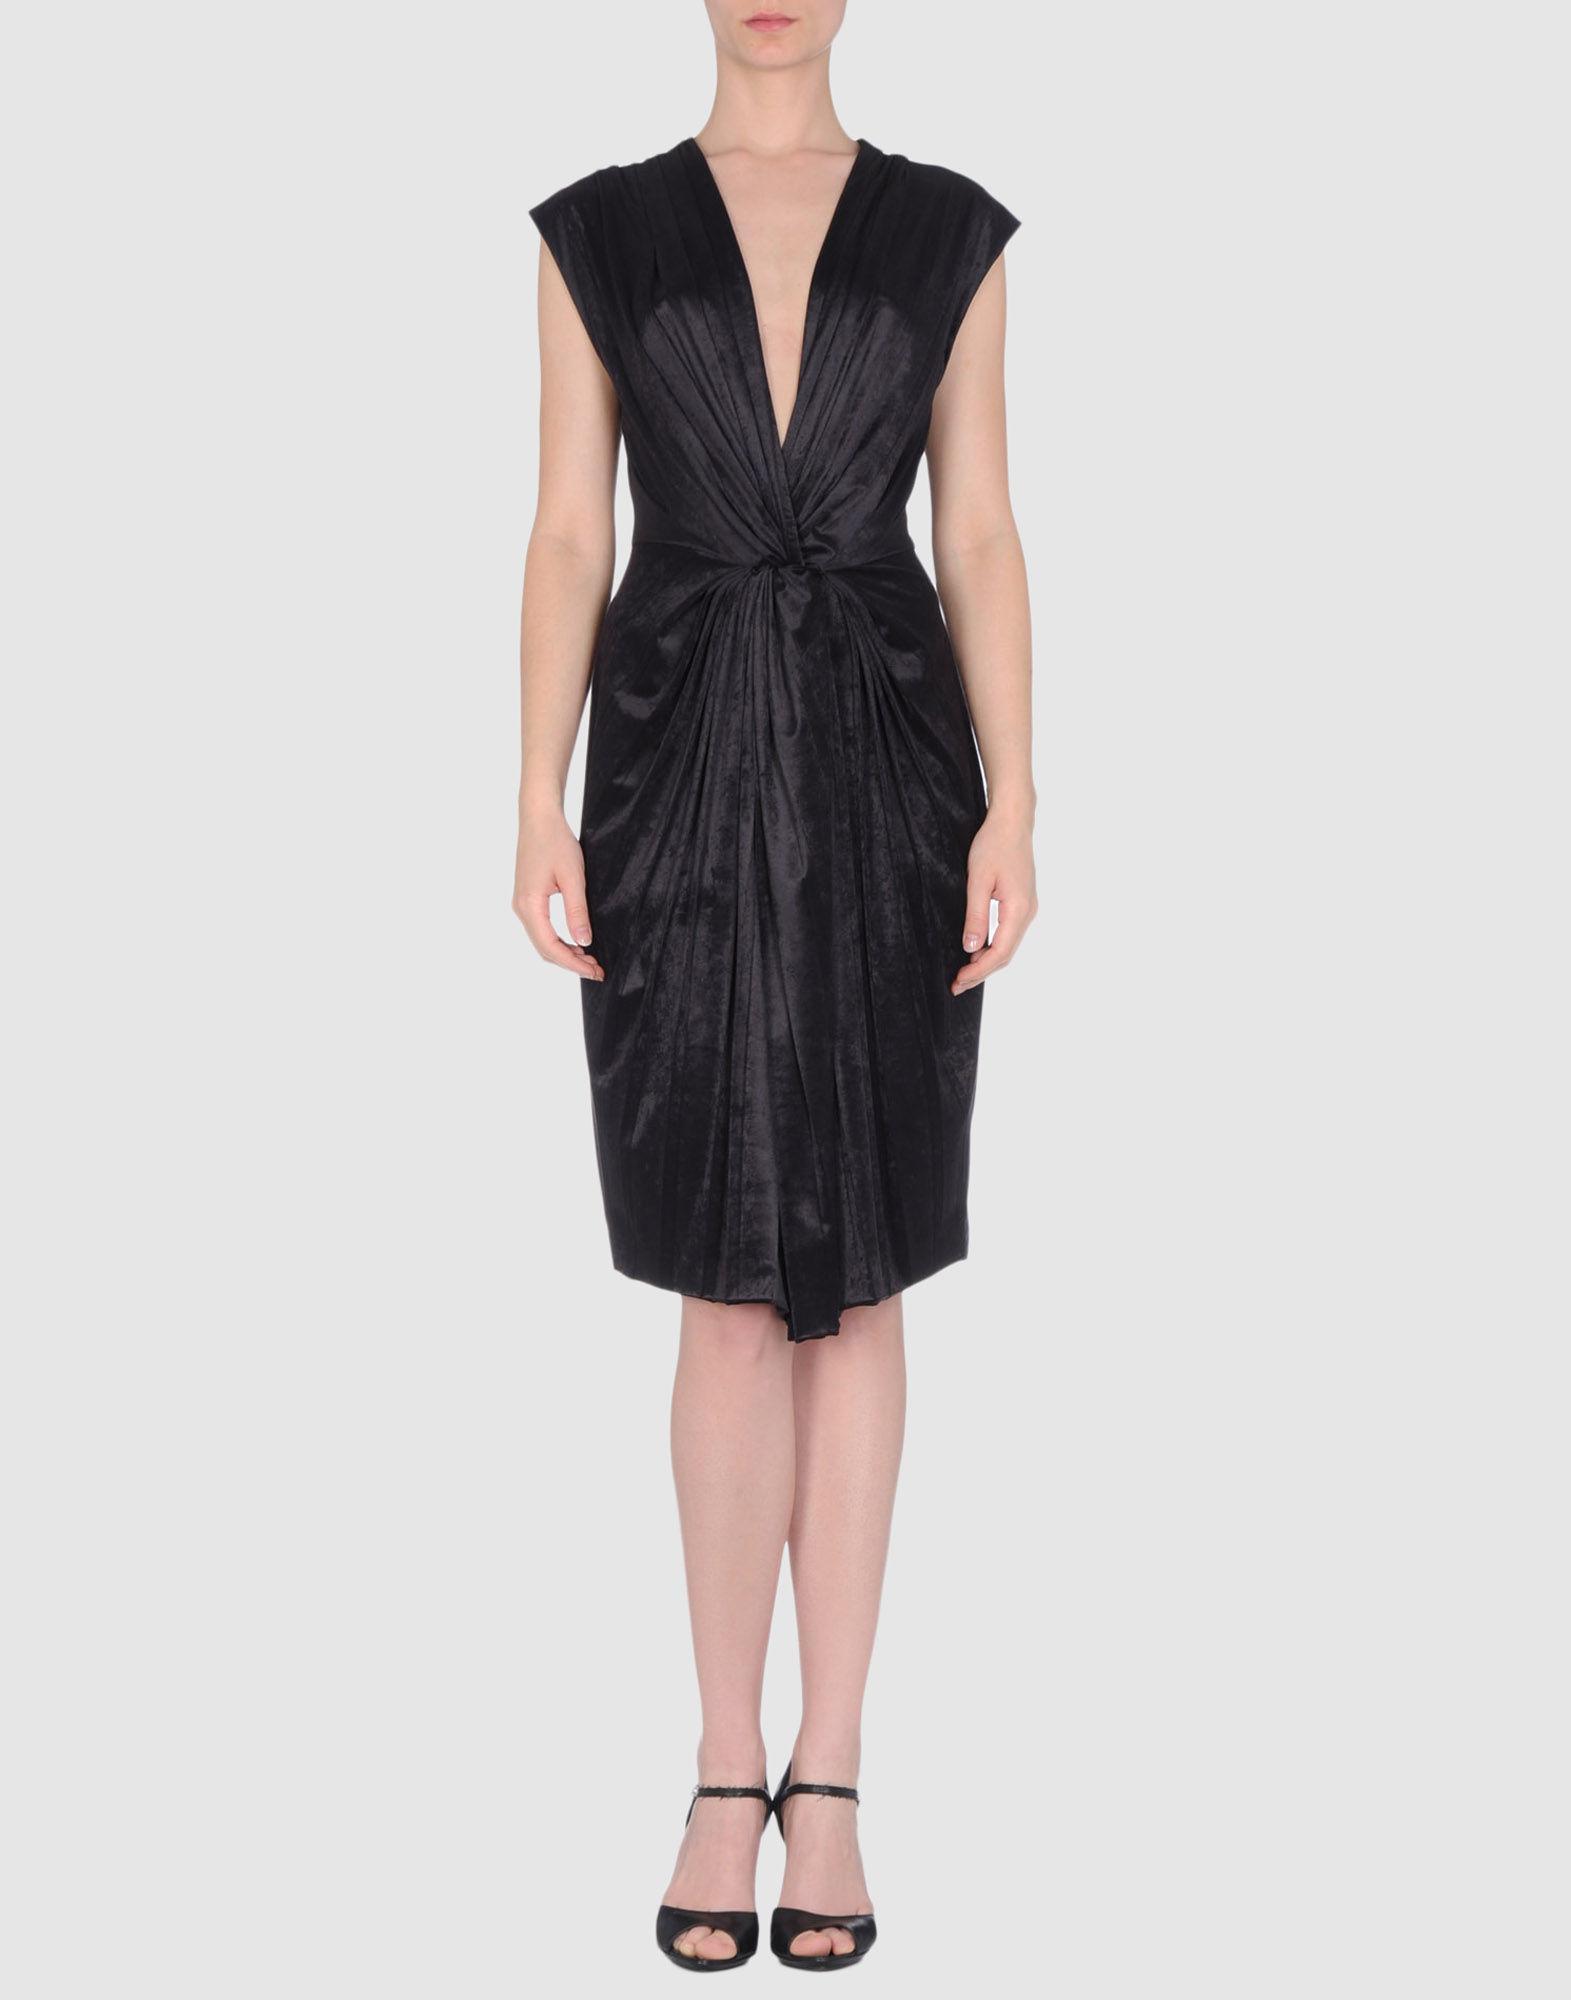 34206714BI 14 f - Βραδυνα Φορεματα Yves Saint Laurent Rive Gauche Κωδ.13